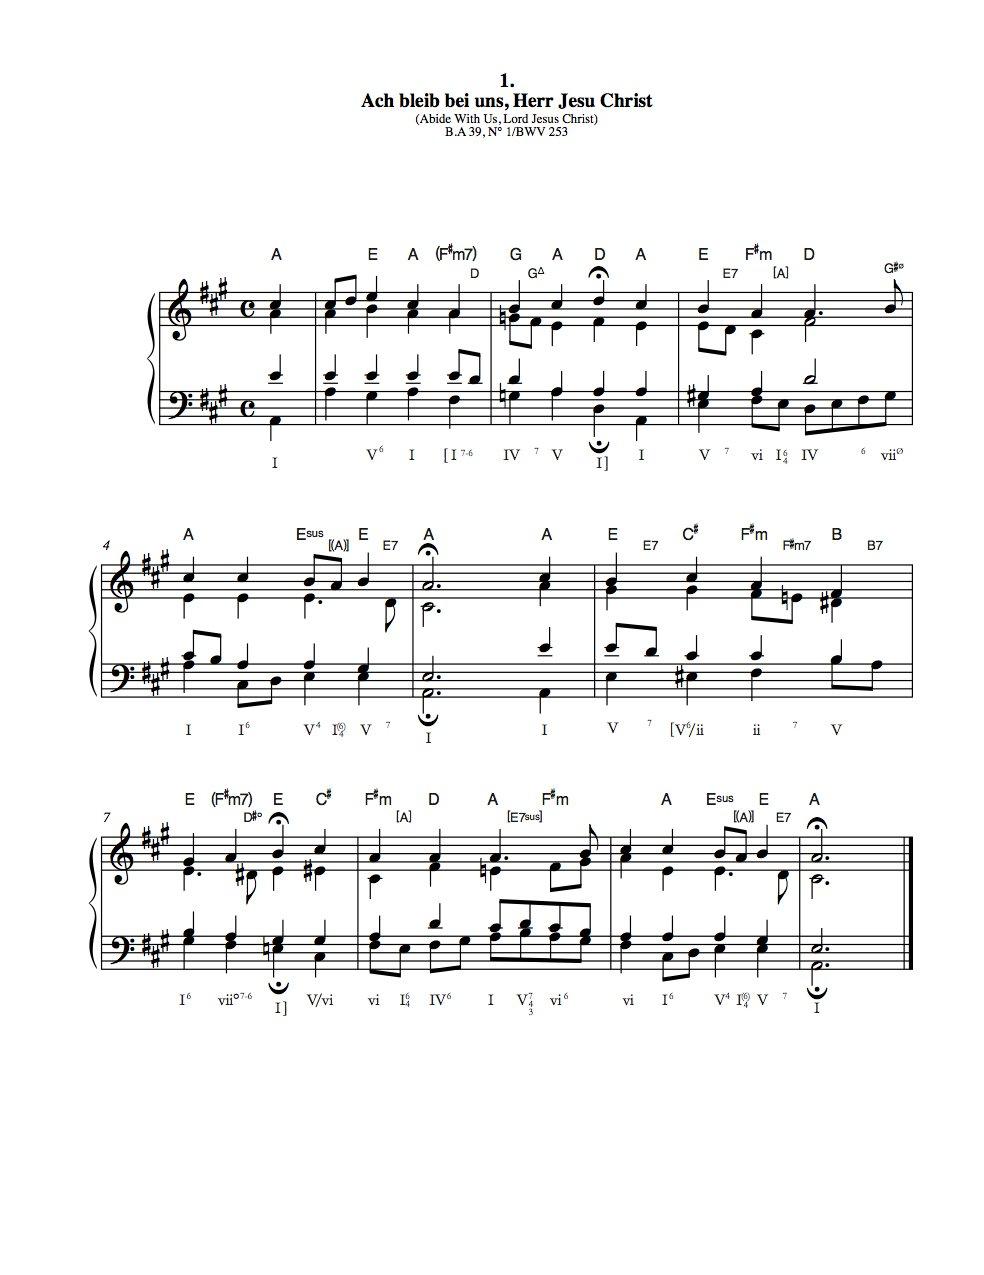 J.S. Bach 413 Chorales: Analyzed: Christopher Czarnecki ...